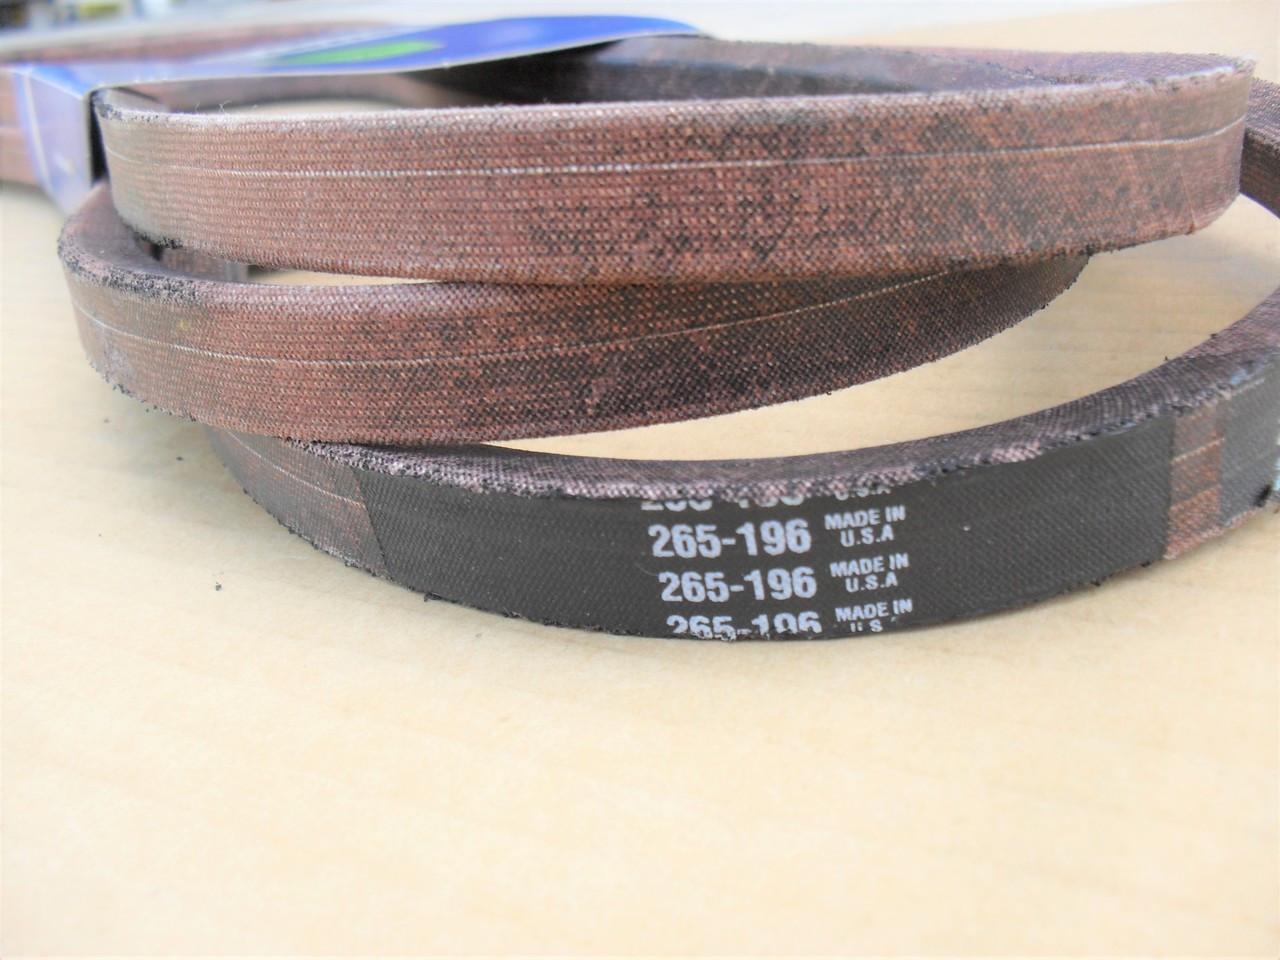 "Deck Belt for Toro GT2100 GT2200 LX500 50"" Cut 1120332, 112-0332"